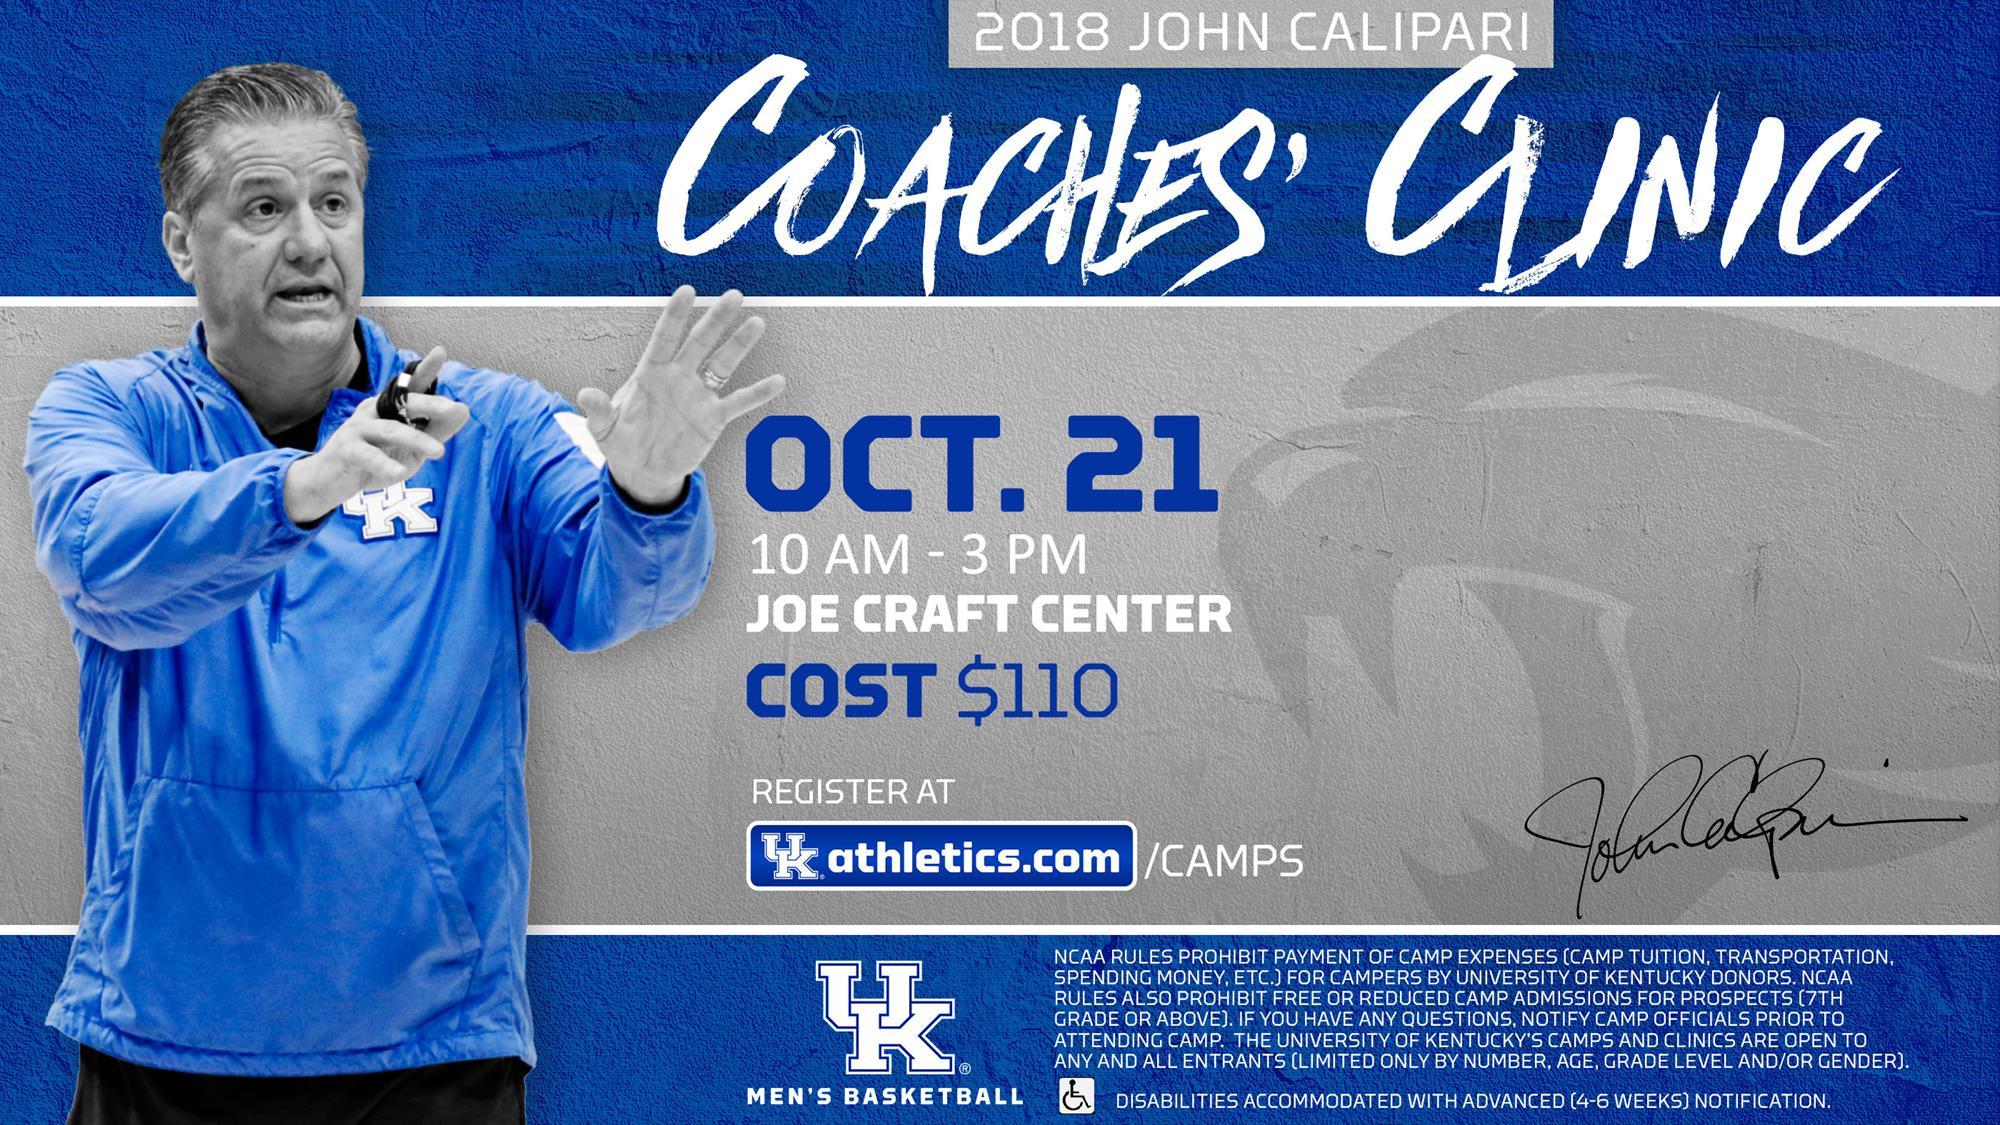 2018 John Calipari Coaches Clinic Set For Oct 21